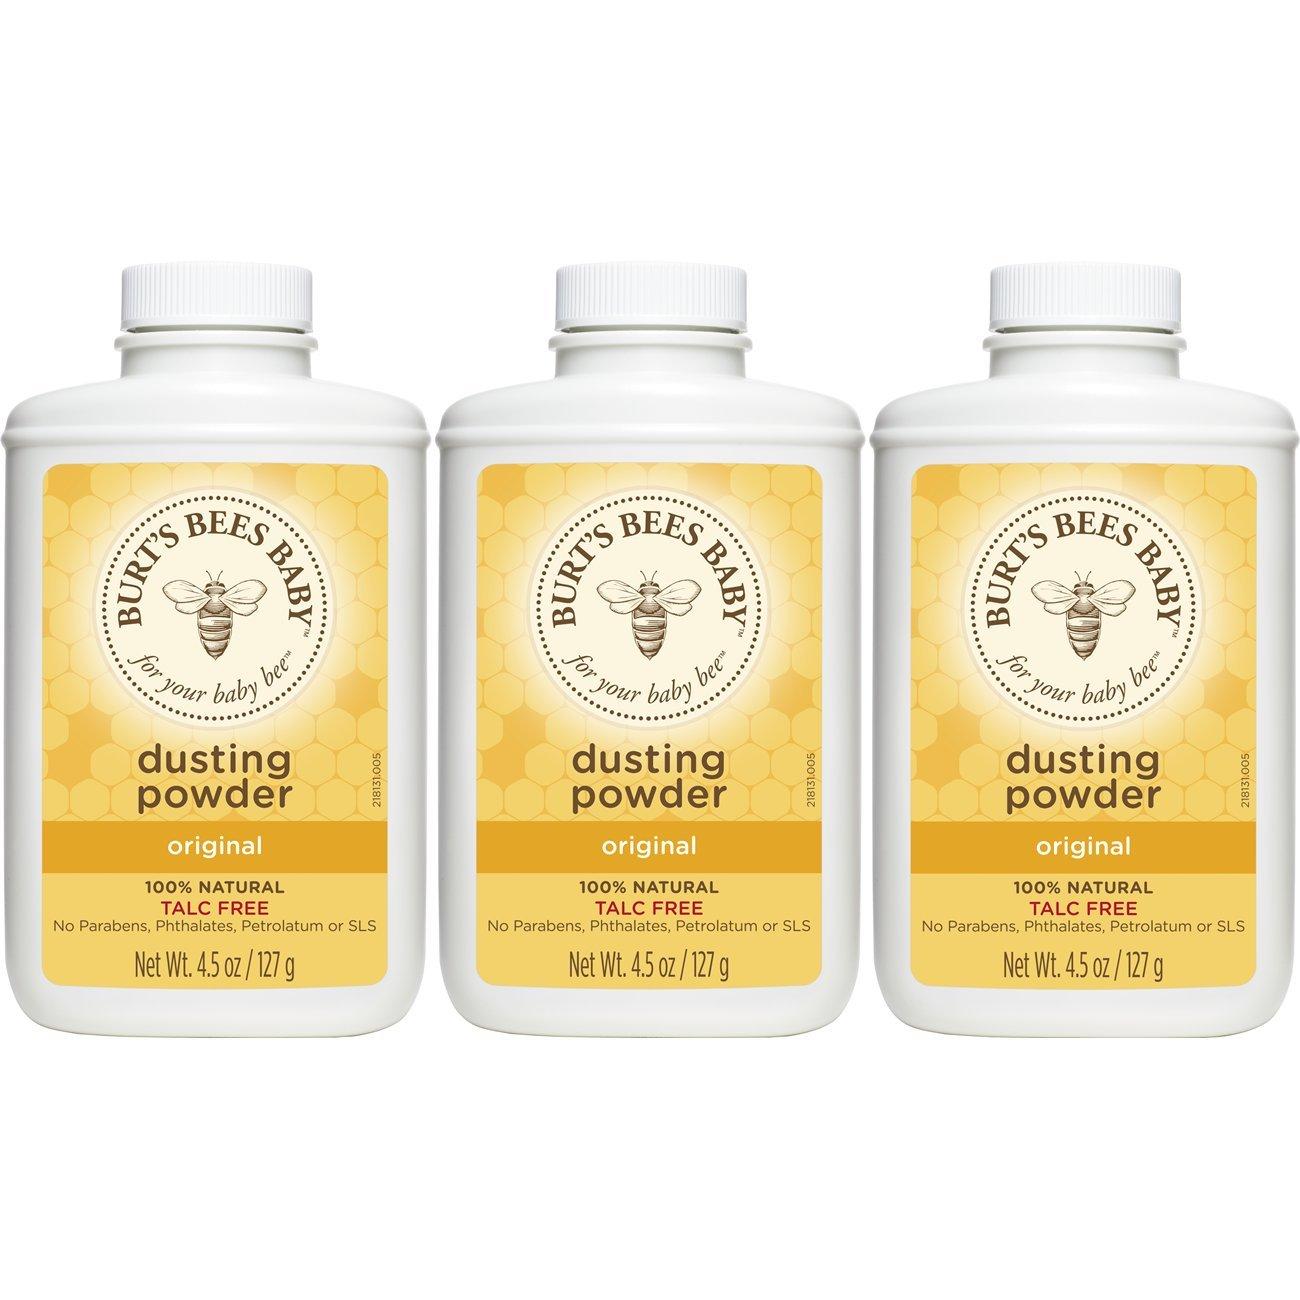 Burt's Bees Baby 100-Percent Natural Dusting Powder, 4.5 Ozs (Pack of 3) (Packaging May Vary) Burt' s Bees 36500-11 CA-3650011